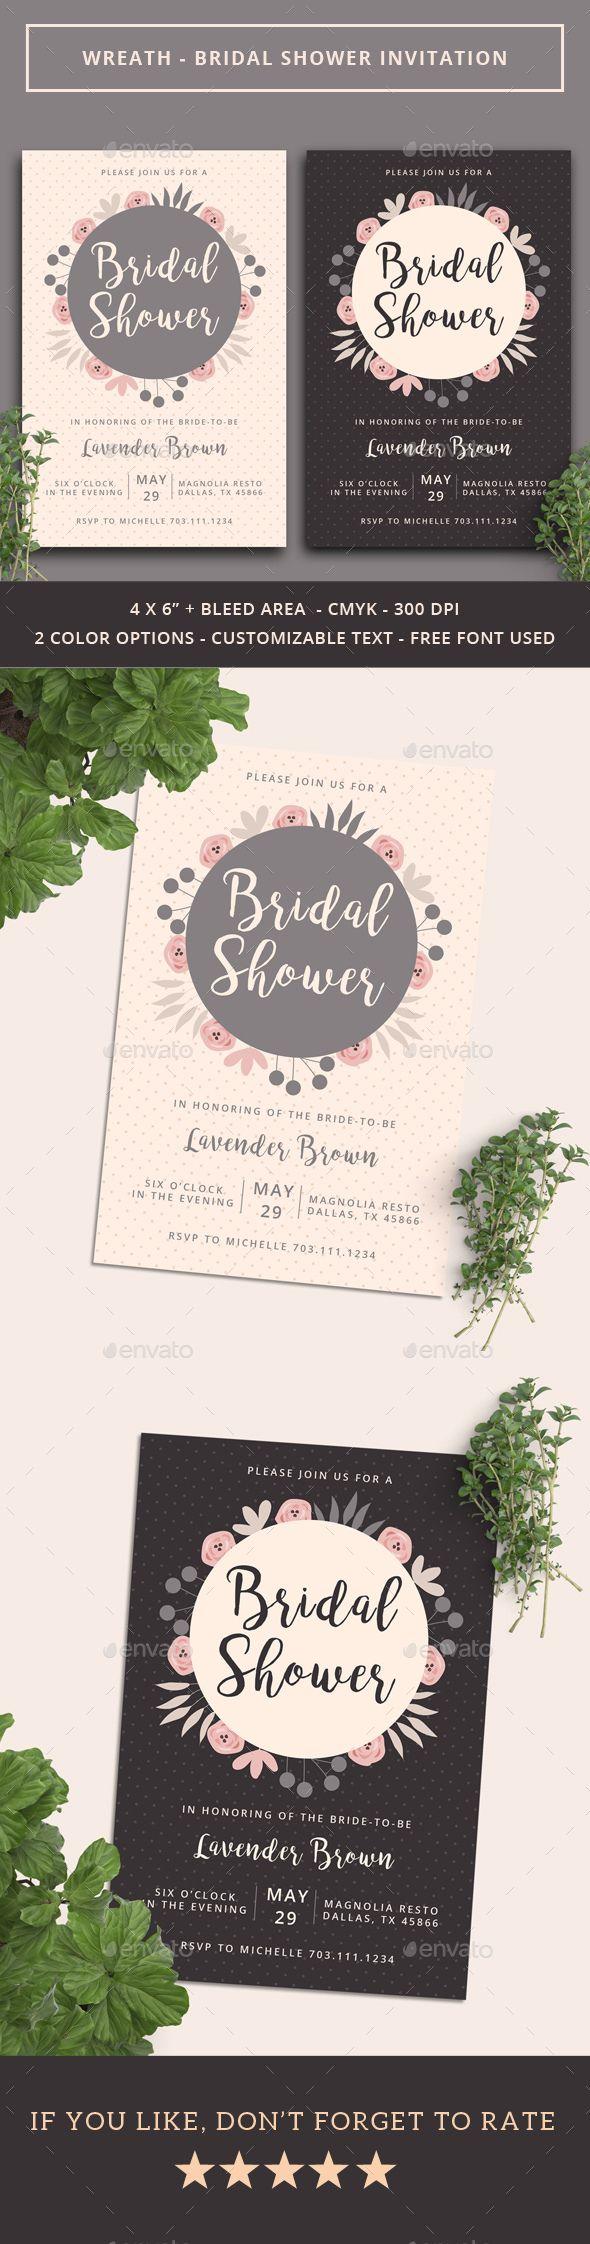 bridal shower invitations vector free%0A Wreath  Bridal Shower Invitation